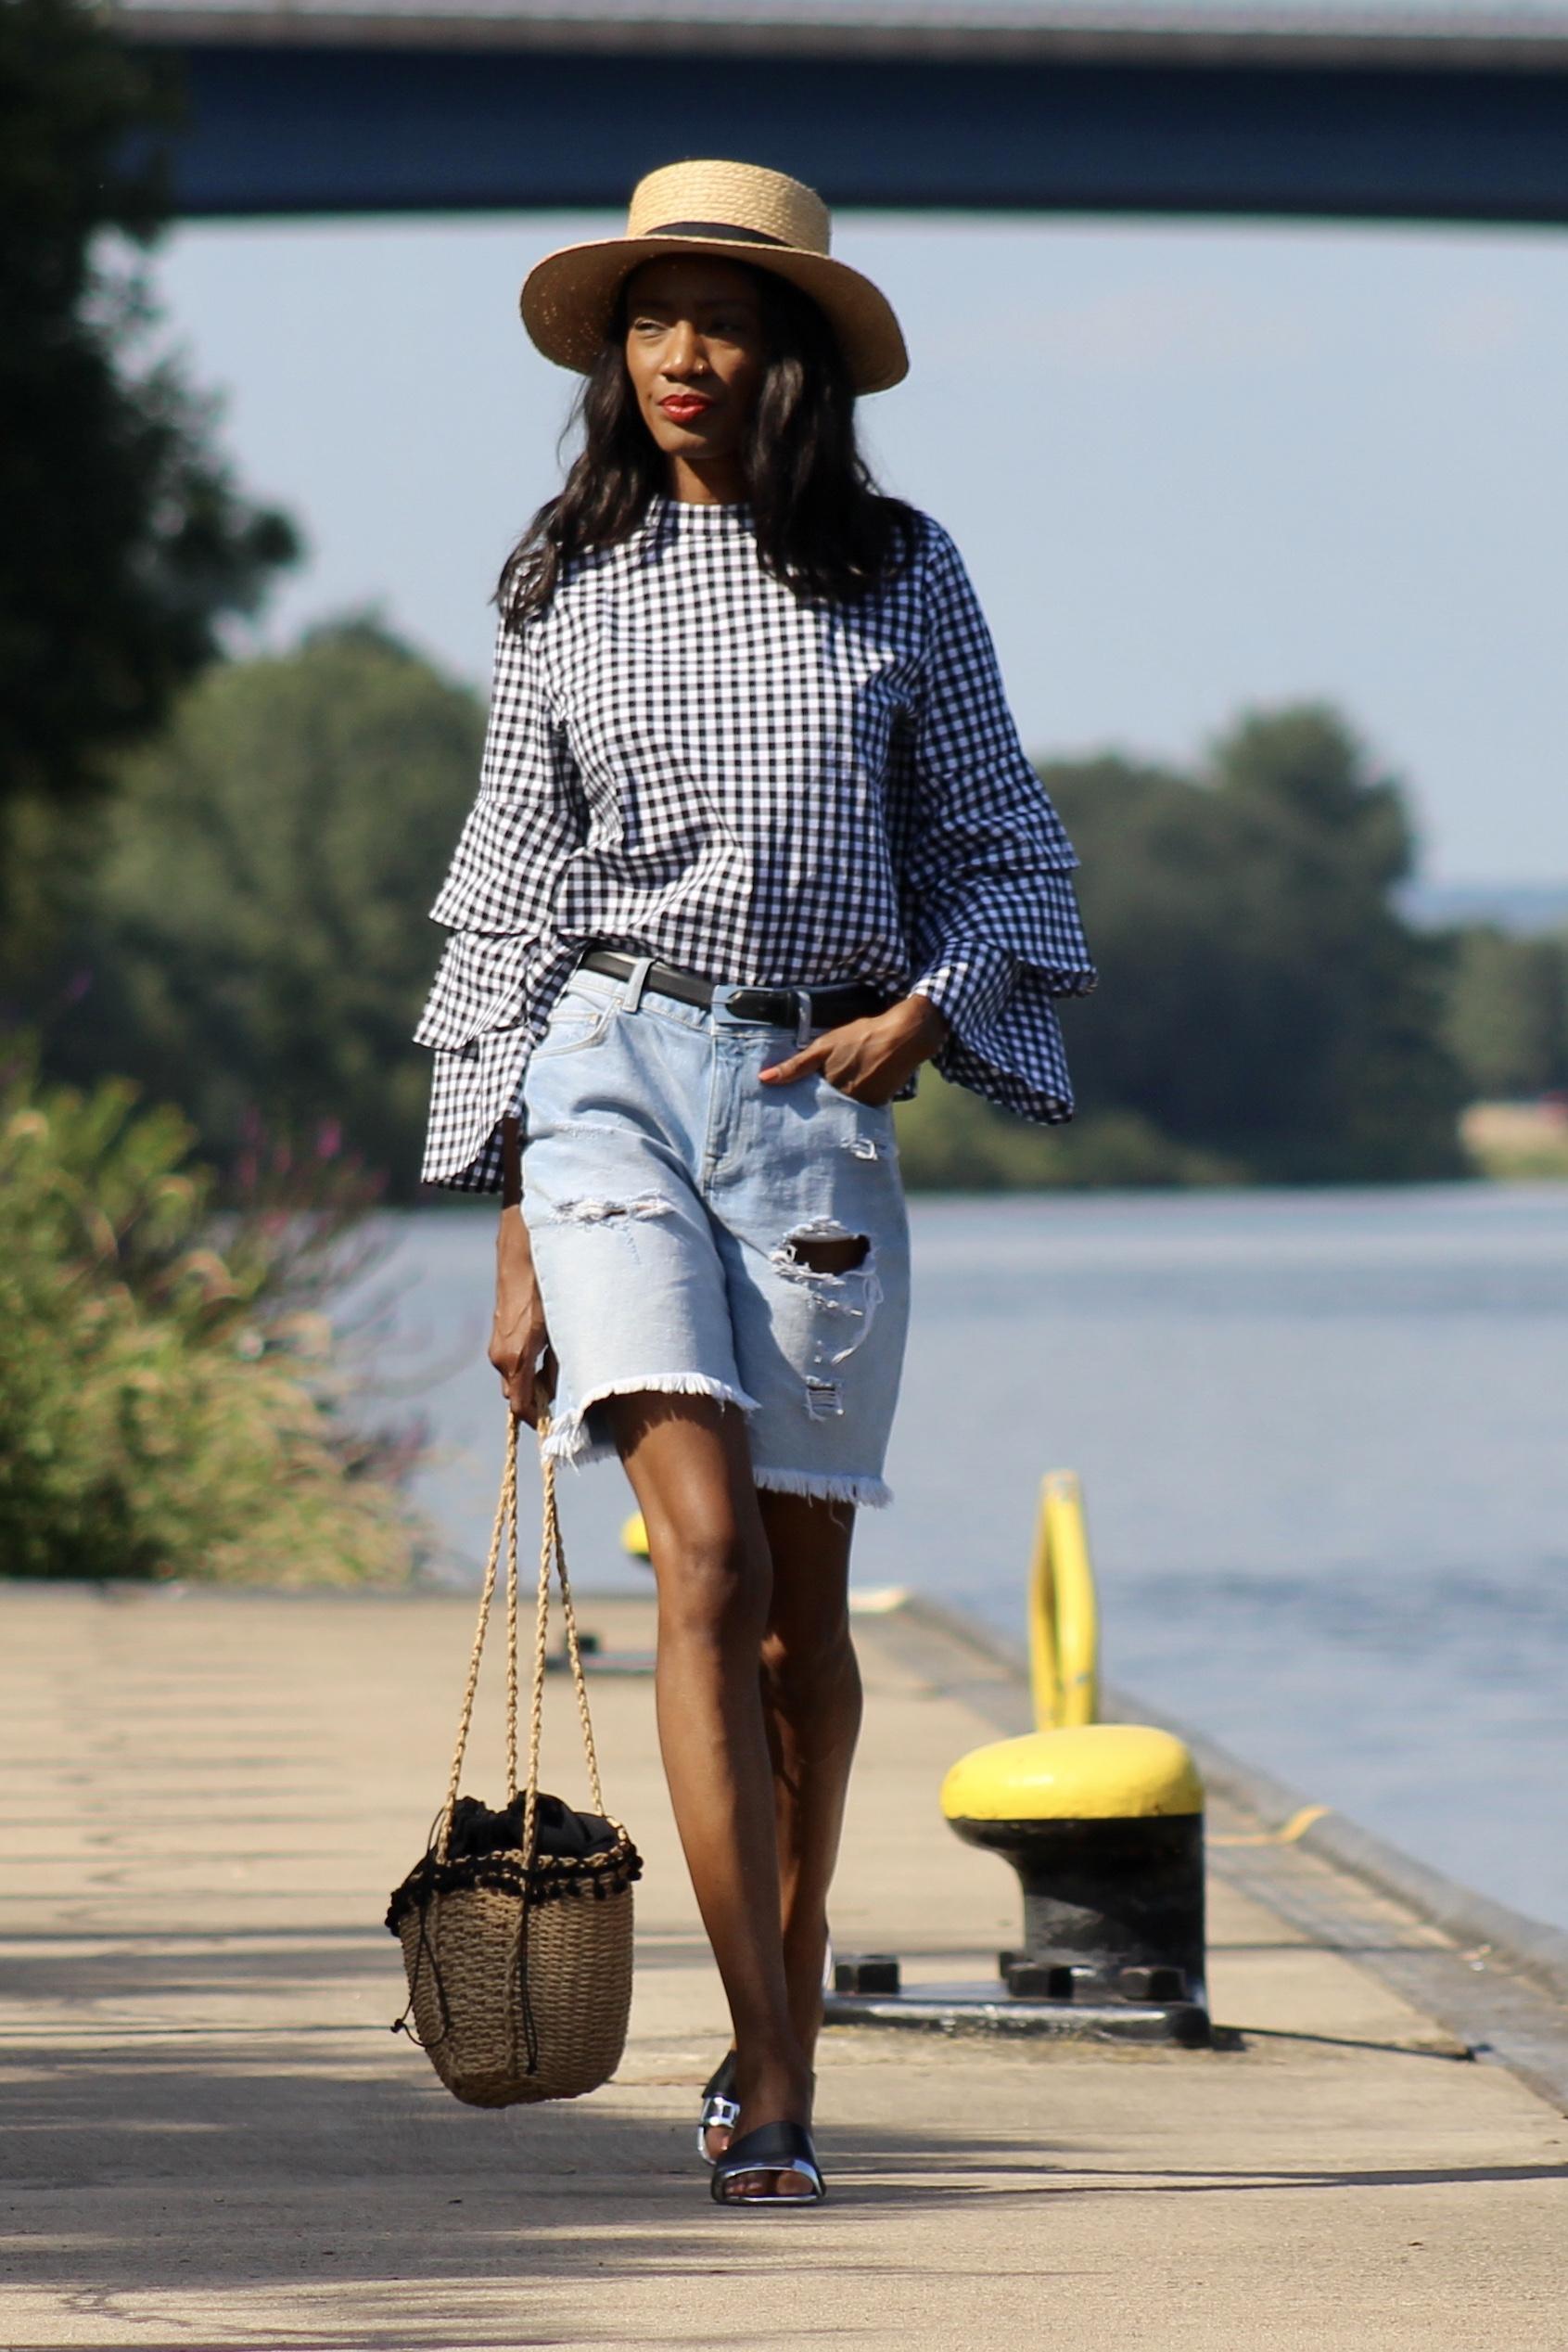 gingham top denim shorts straw hat sandals